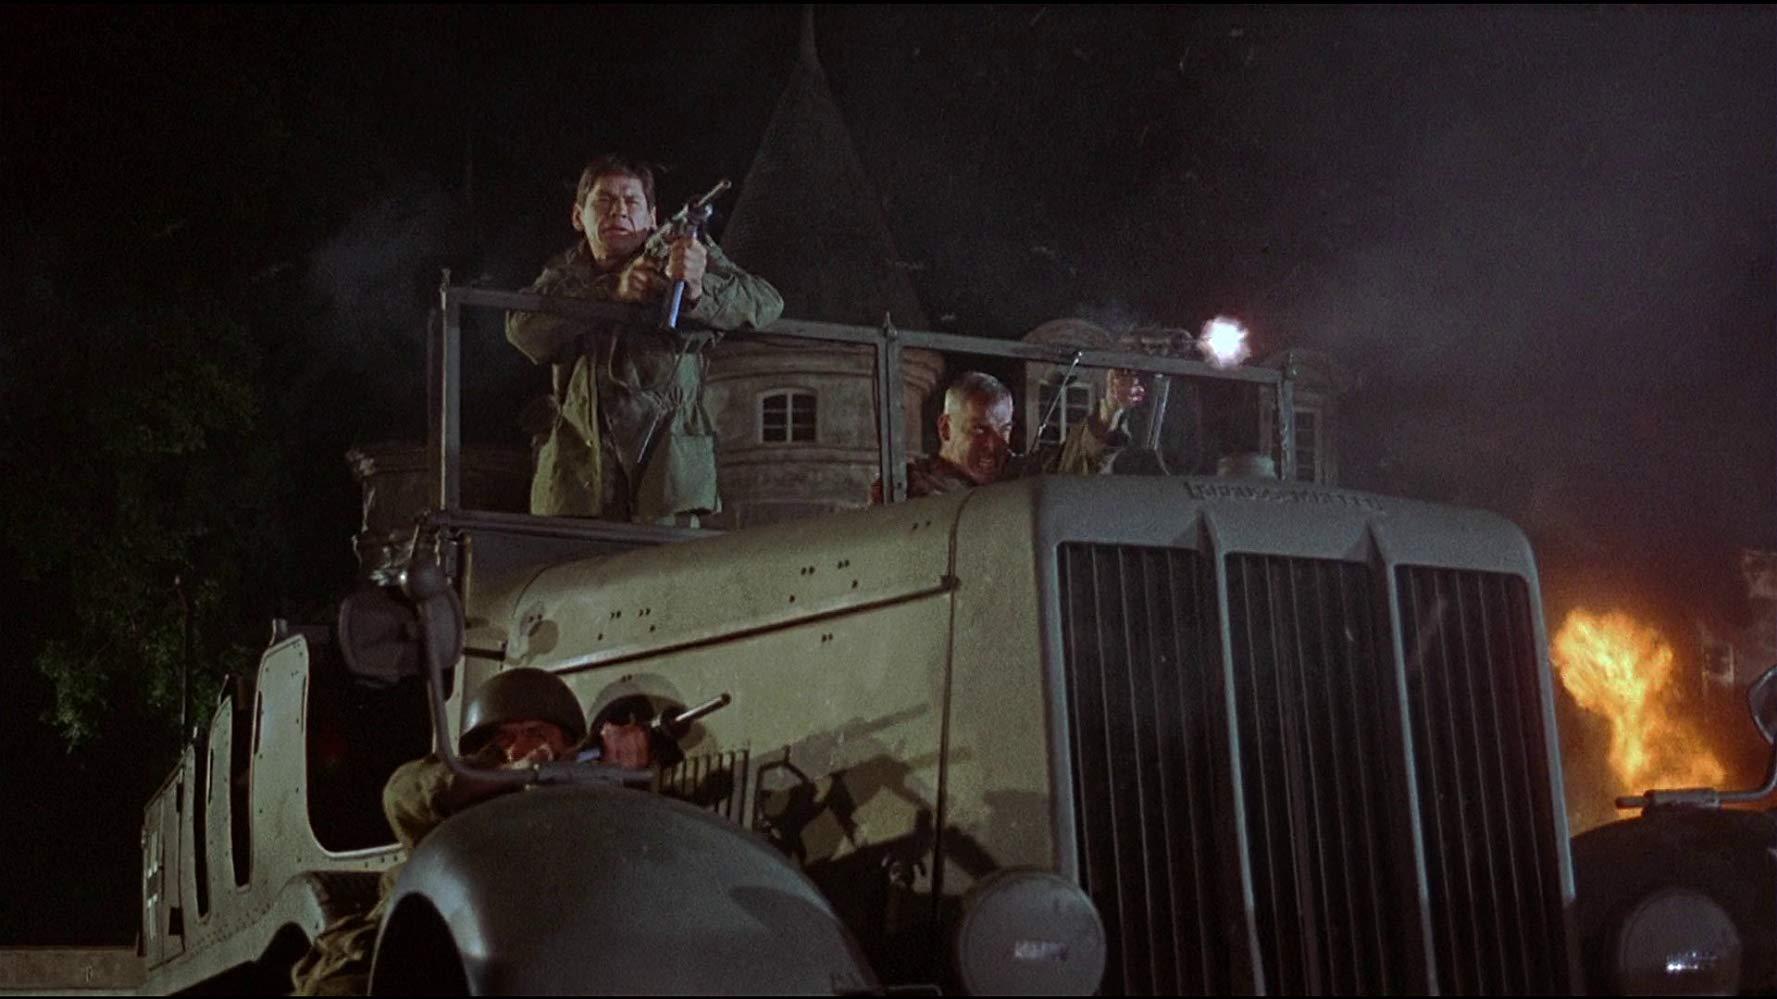 Slaughterhouse Twelve: Robert Aldrich's 'The Dirty Dozen